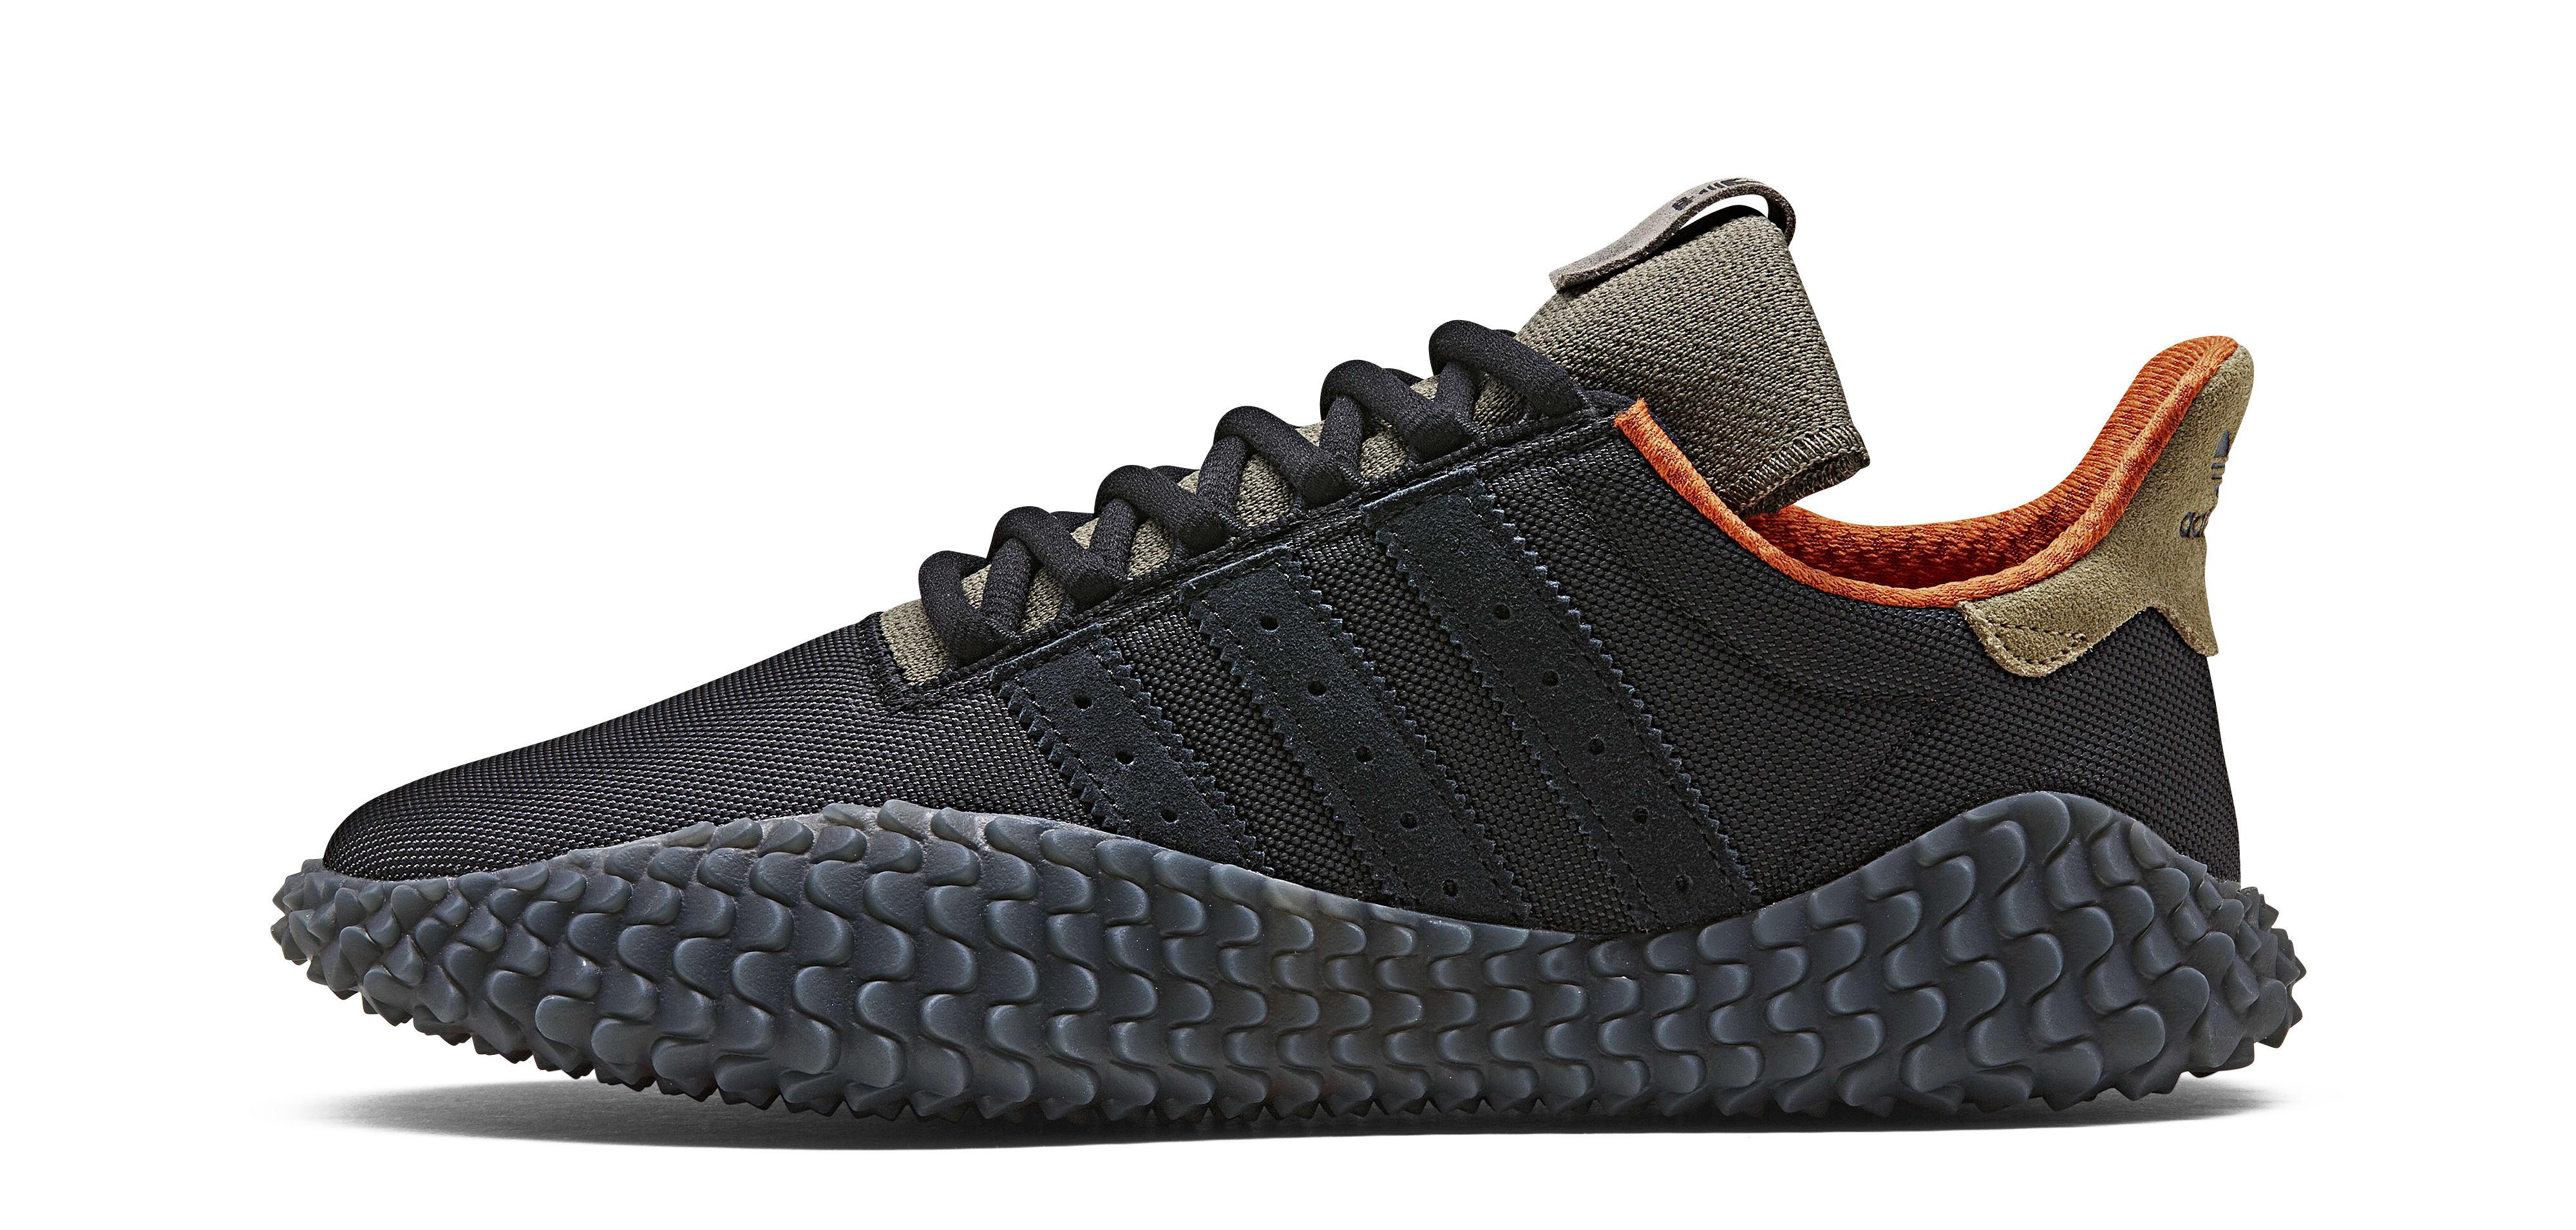 Bodega x Adidas Kamanda BB9243 (Lateral)